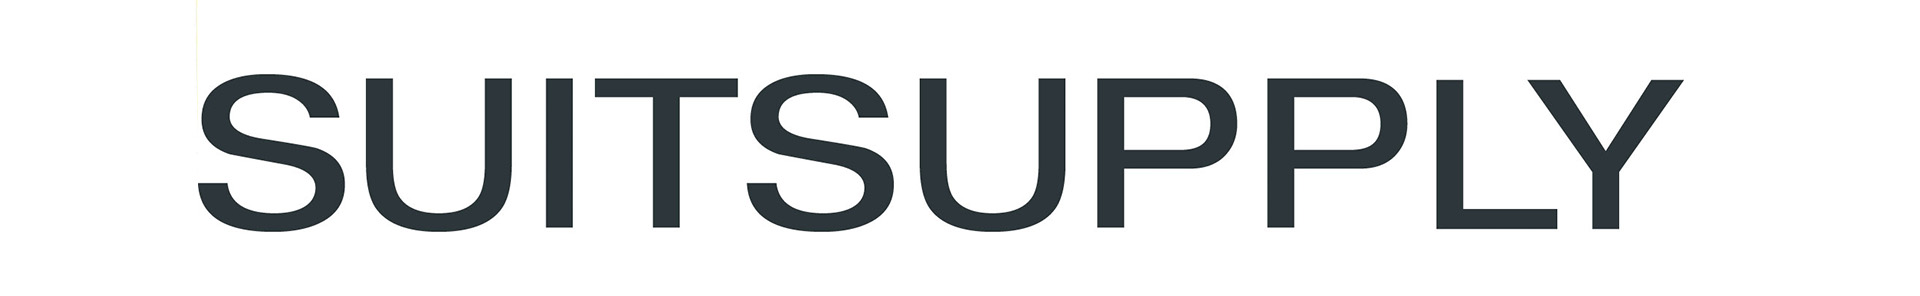 Suitsupply_Logo_yVO6QMv.jpg